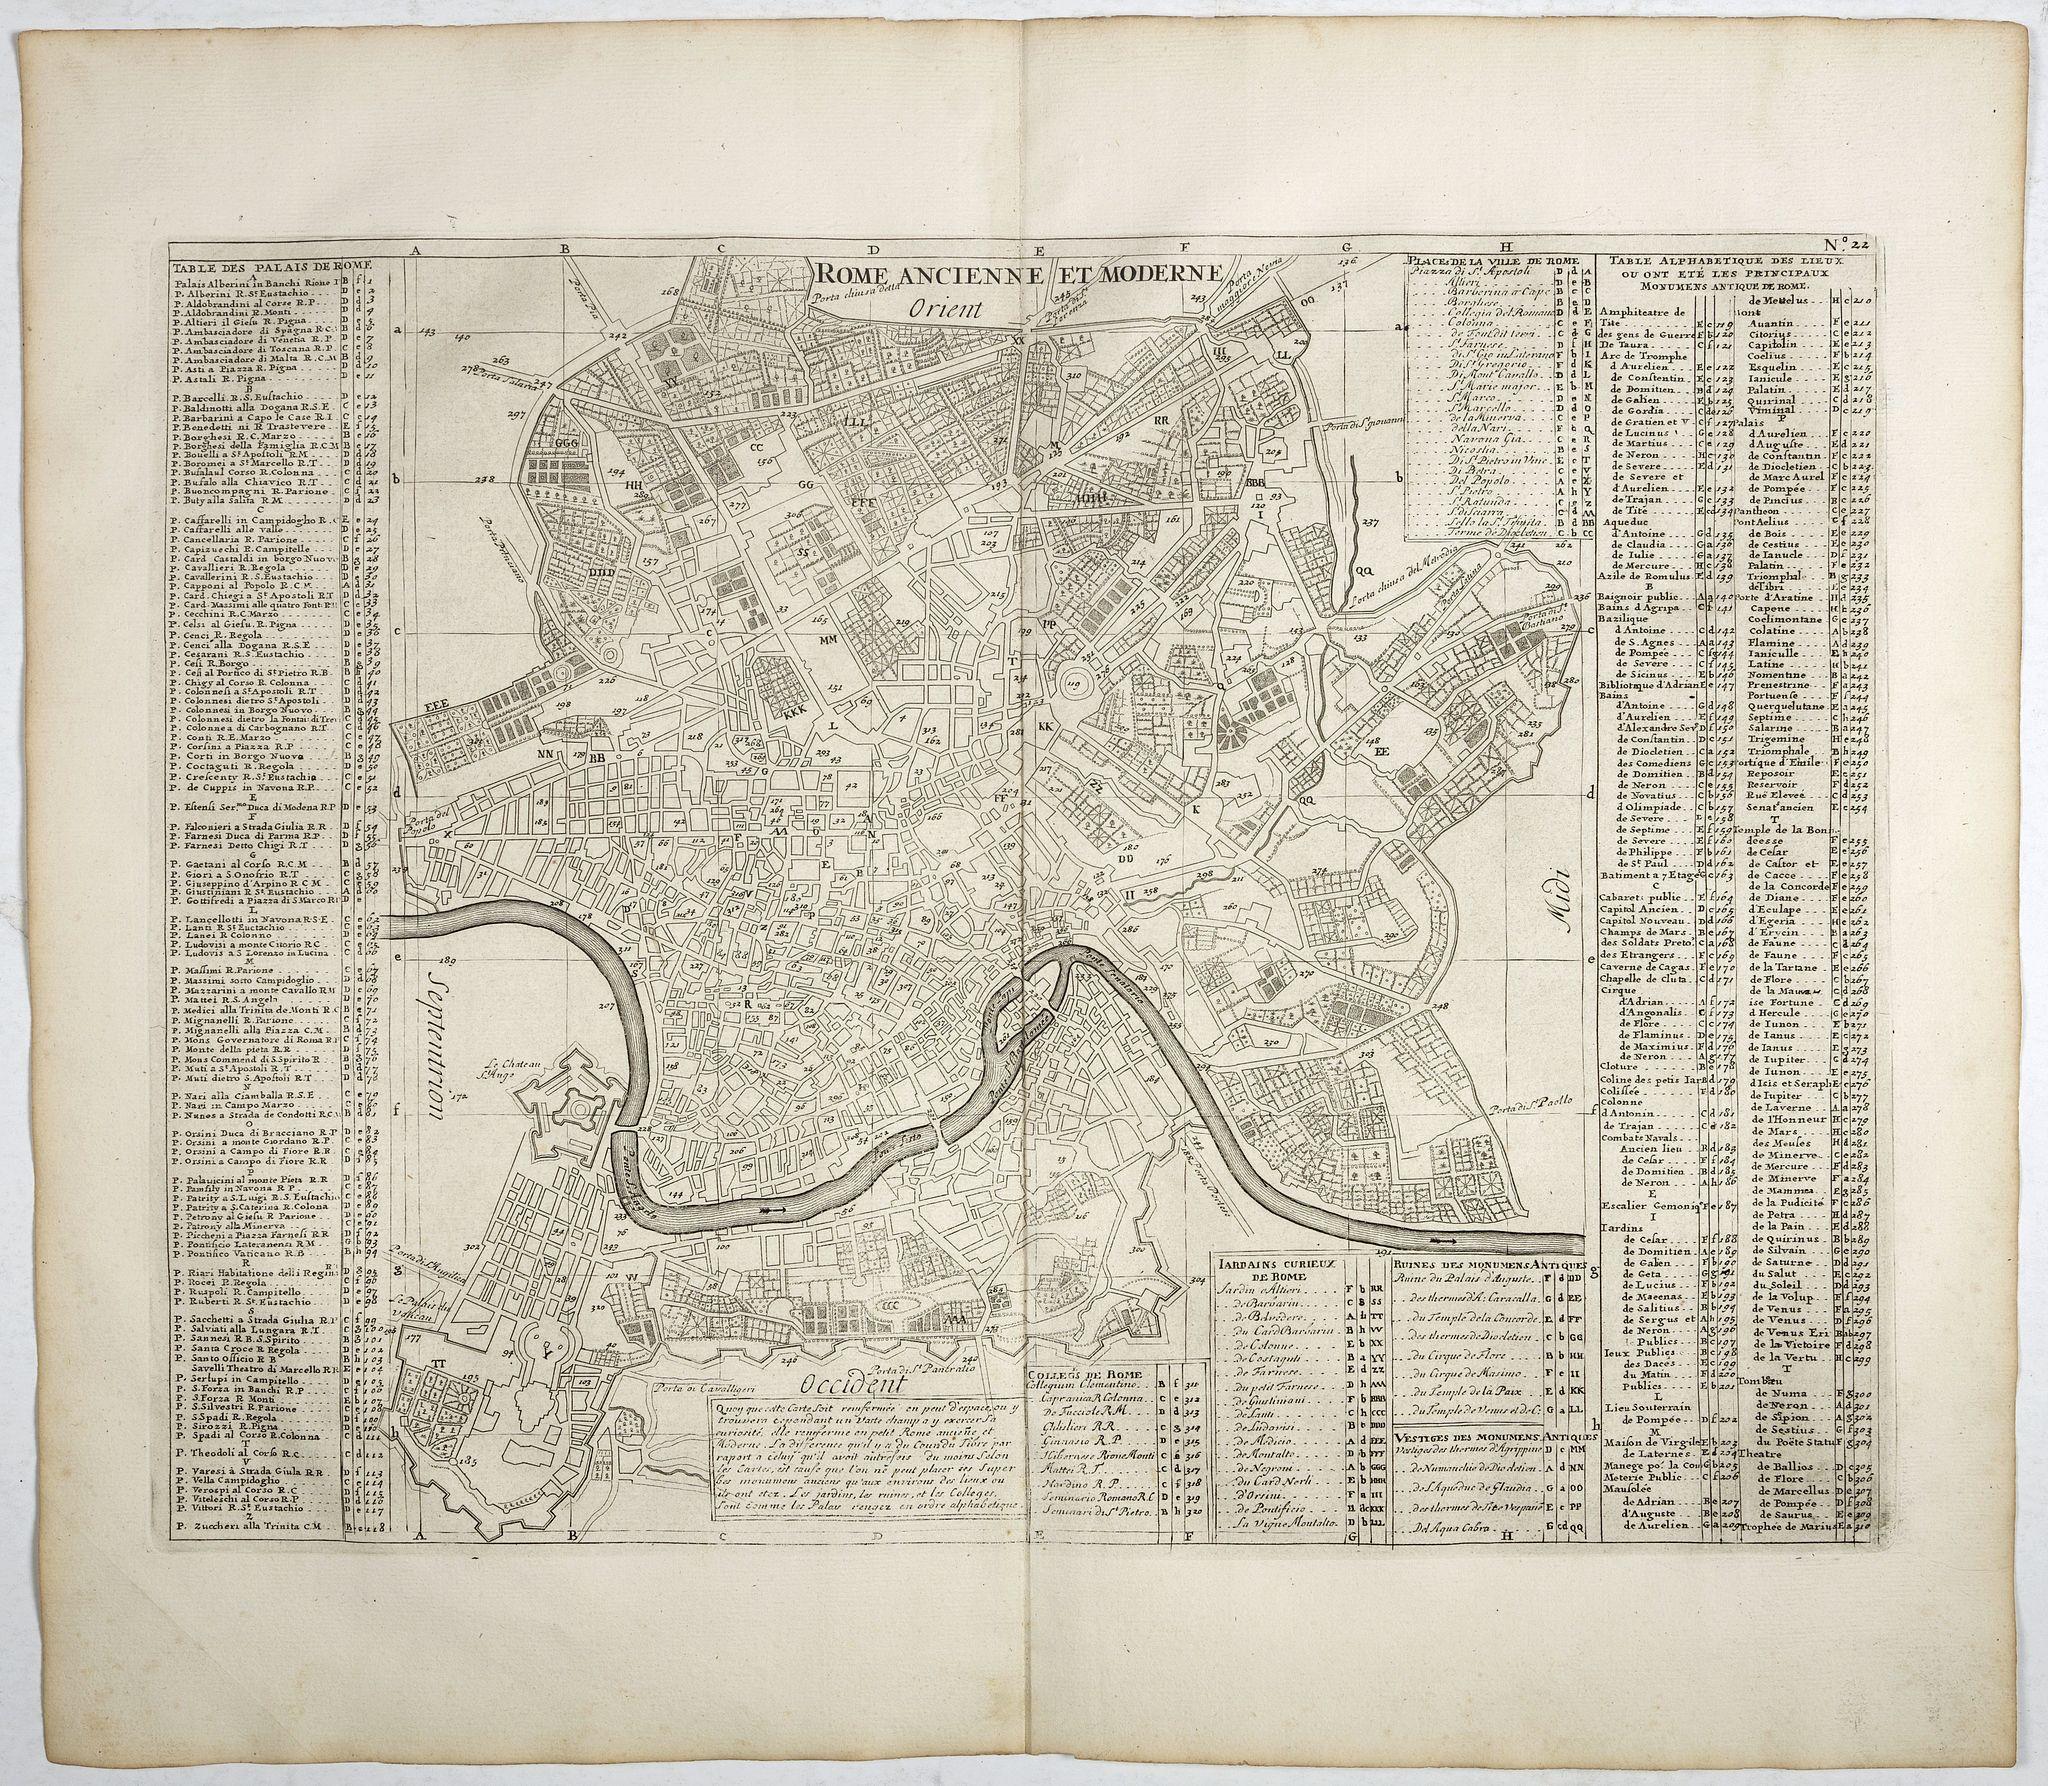 CHATELAIN,H. -  Rome Ancienne et Moderne.